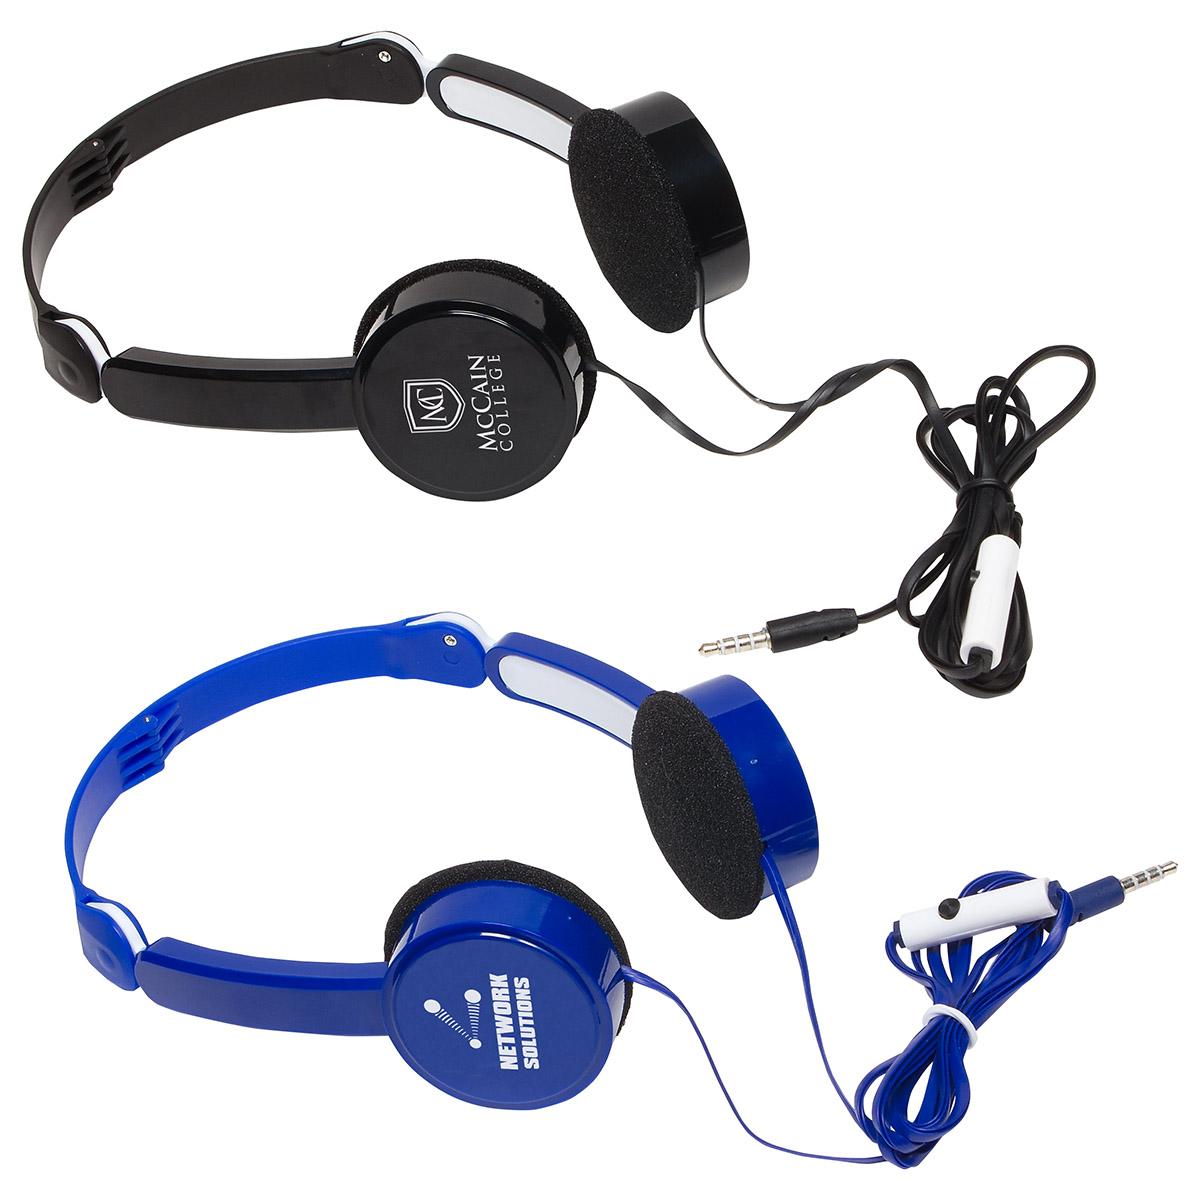 Compact Folding Headphones, WTV-CF16 - 1 Colour Imprint